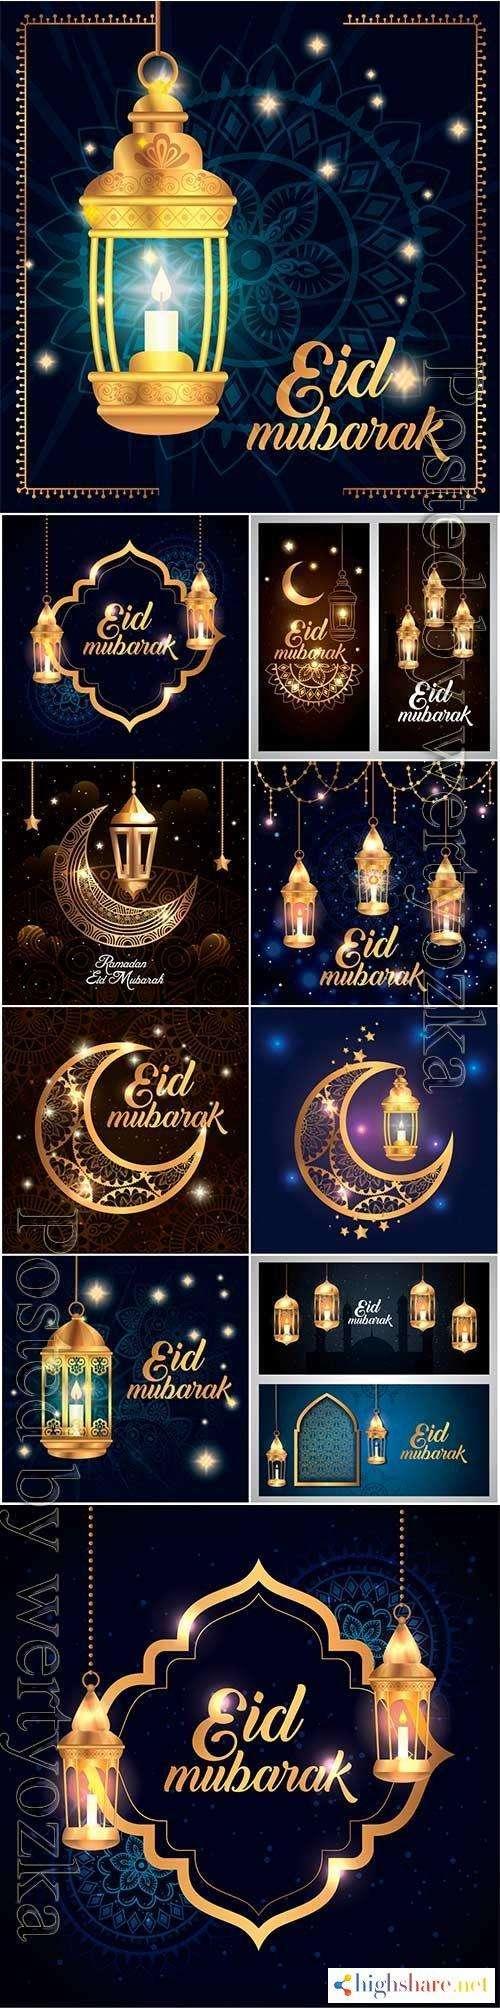 eid mubarak poster with lantern hanging and decoration vector illustration 5f438378a53a2 - Eid mubarak poster with lantern hanging and decoration vector illustration